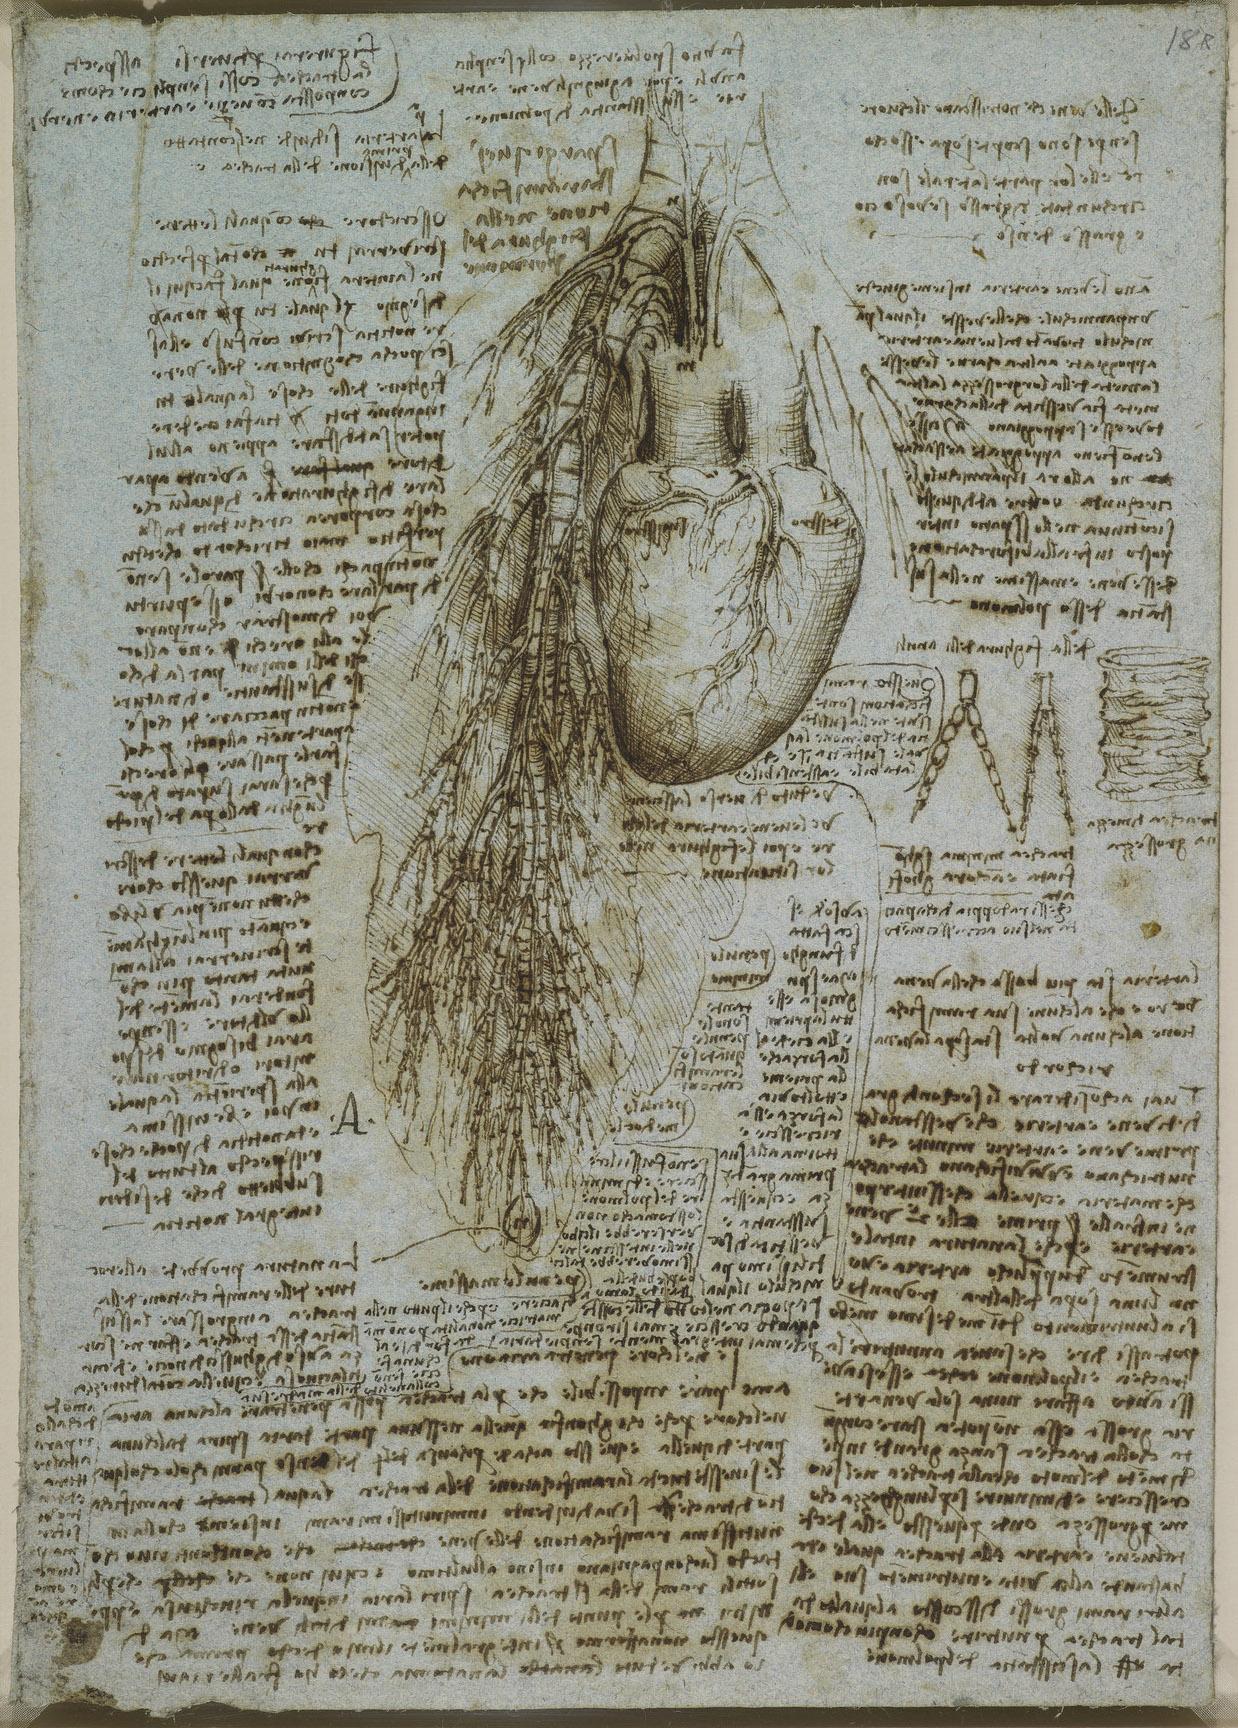 Про, анатомические картинки леонардо да винчи